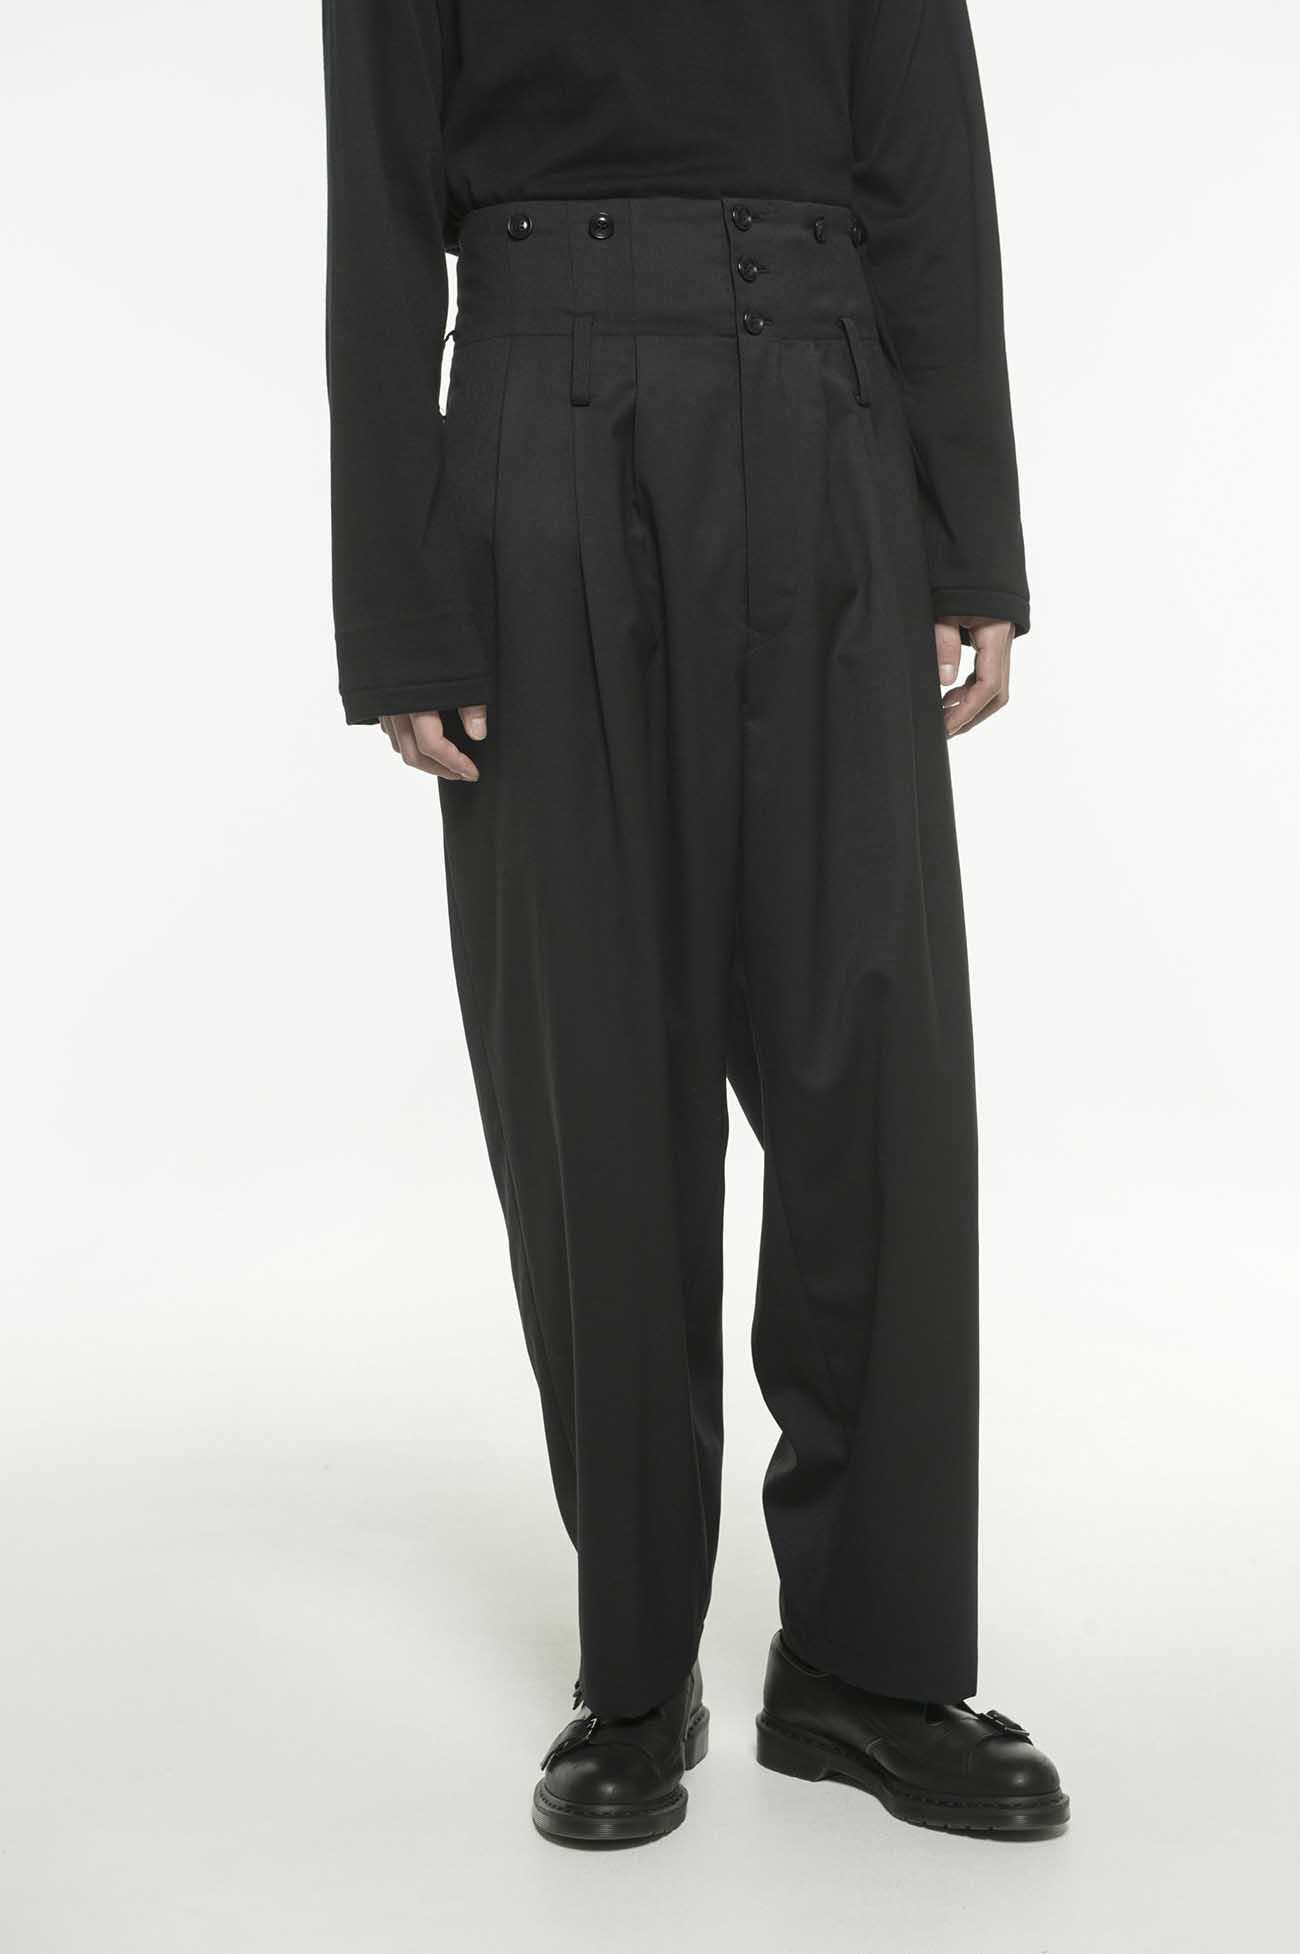 T/W Twill 3Tuck High Waist Wide Suspenders Pants